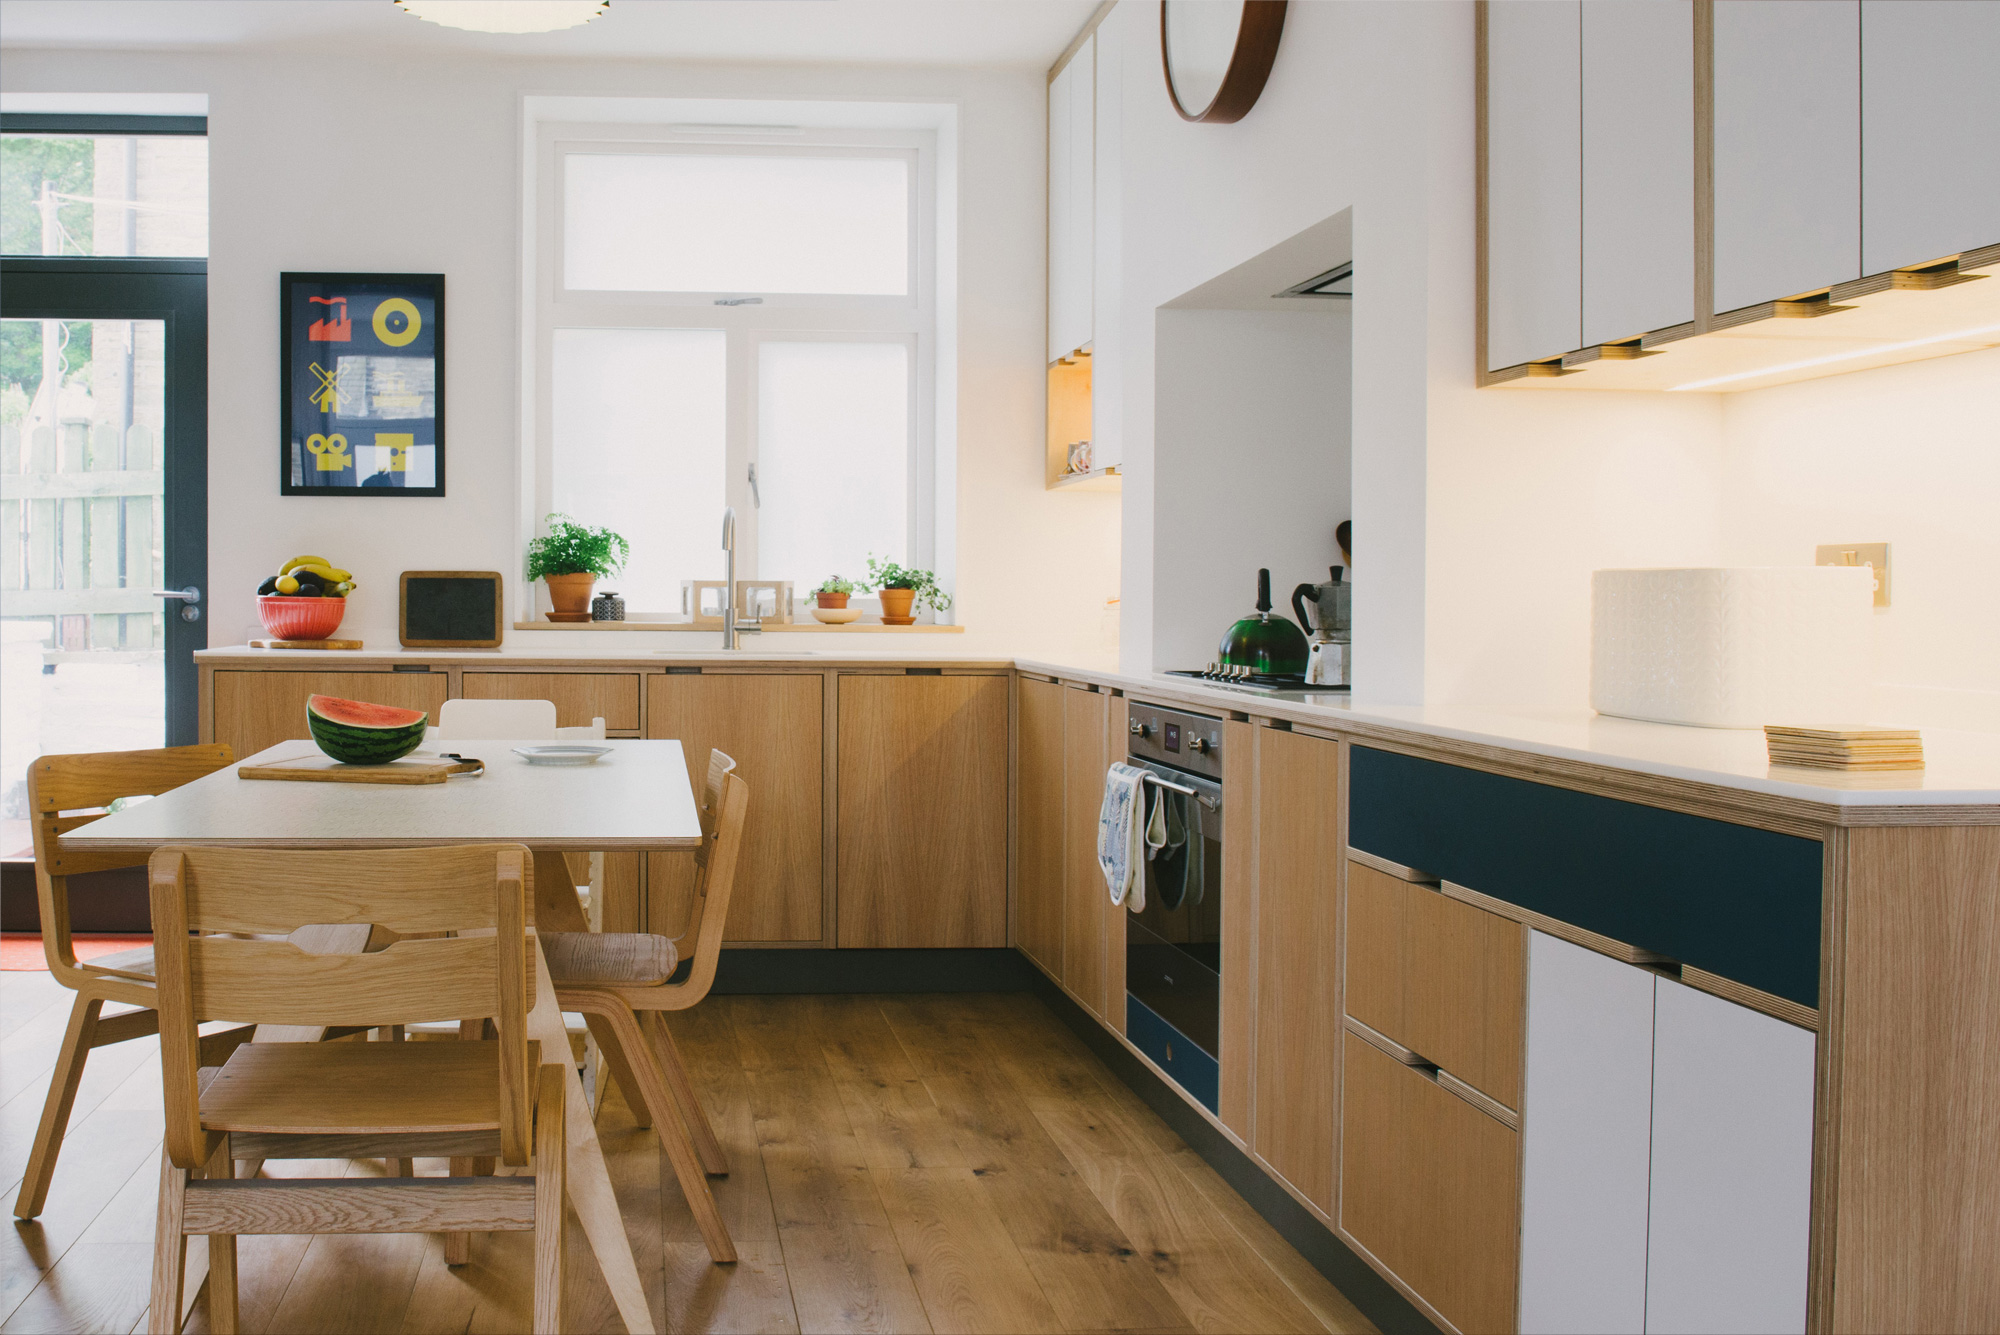 Bespoke plywood kitchen - Oak veneer kitchen